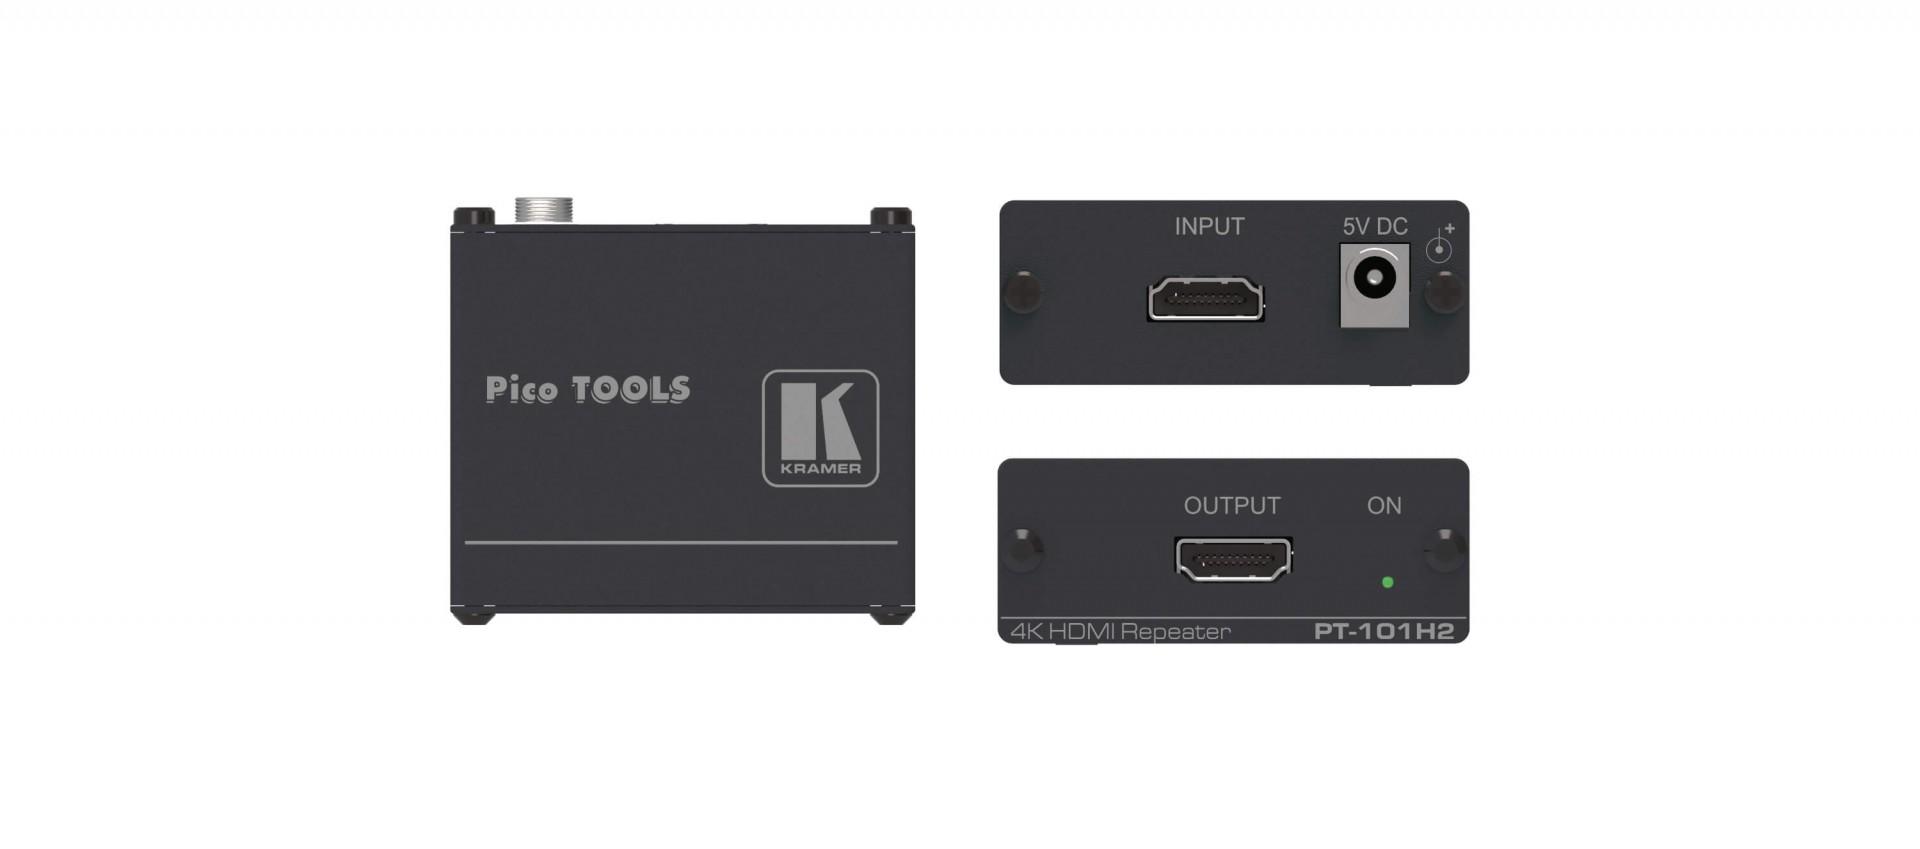 Kramer PT-101H2 - 4K HDR HDMI Repeater